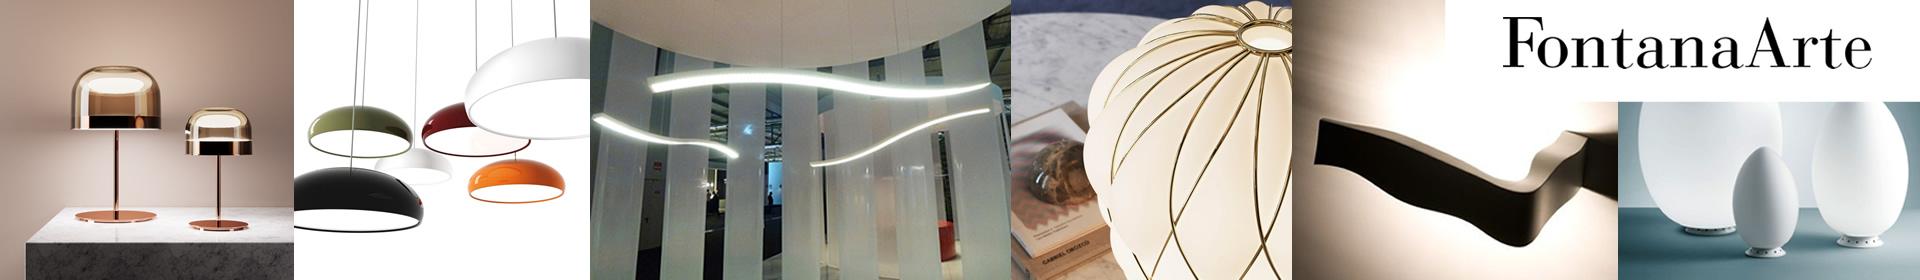 Lampade Fontana Arte vendita lampadari on line